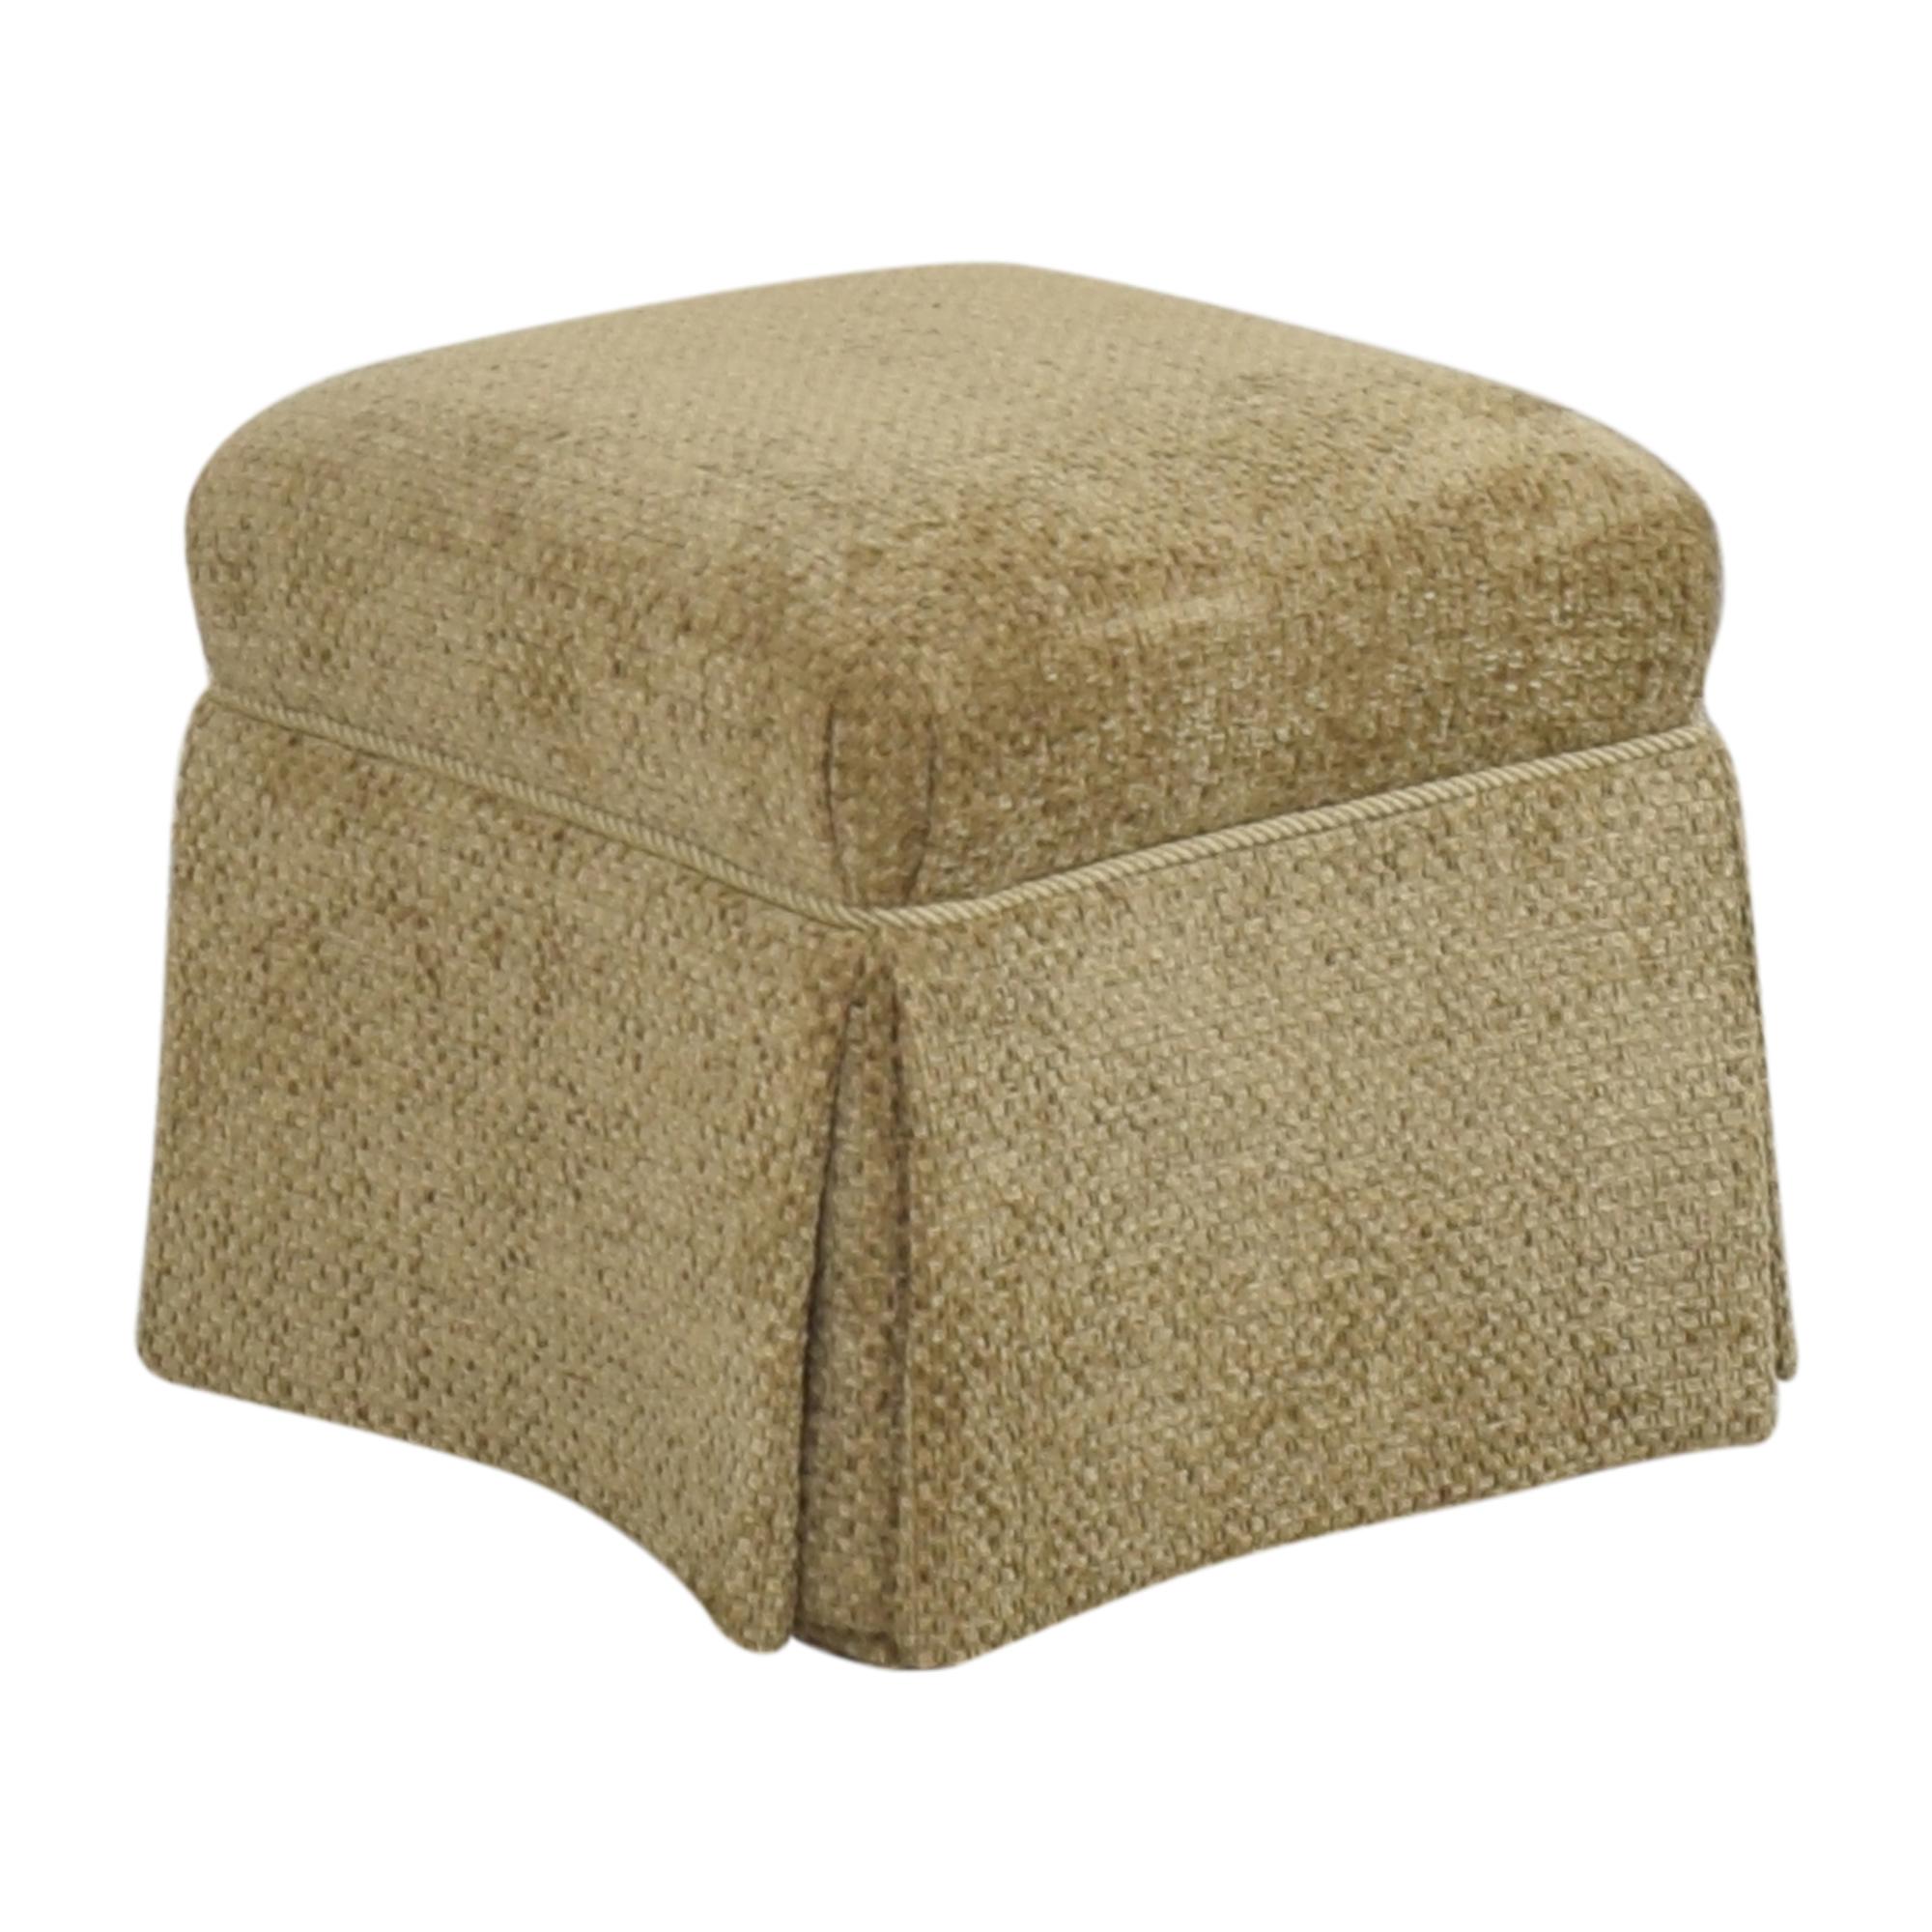 buy Sherrill Furniture Sherrill Furniture Skirted Ottoman online